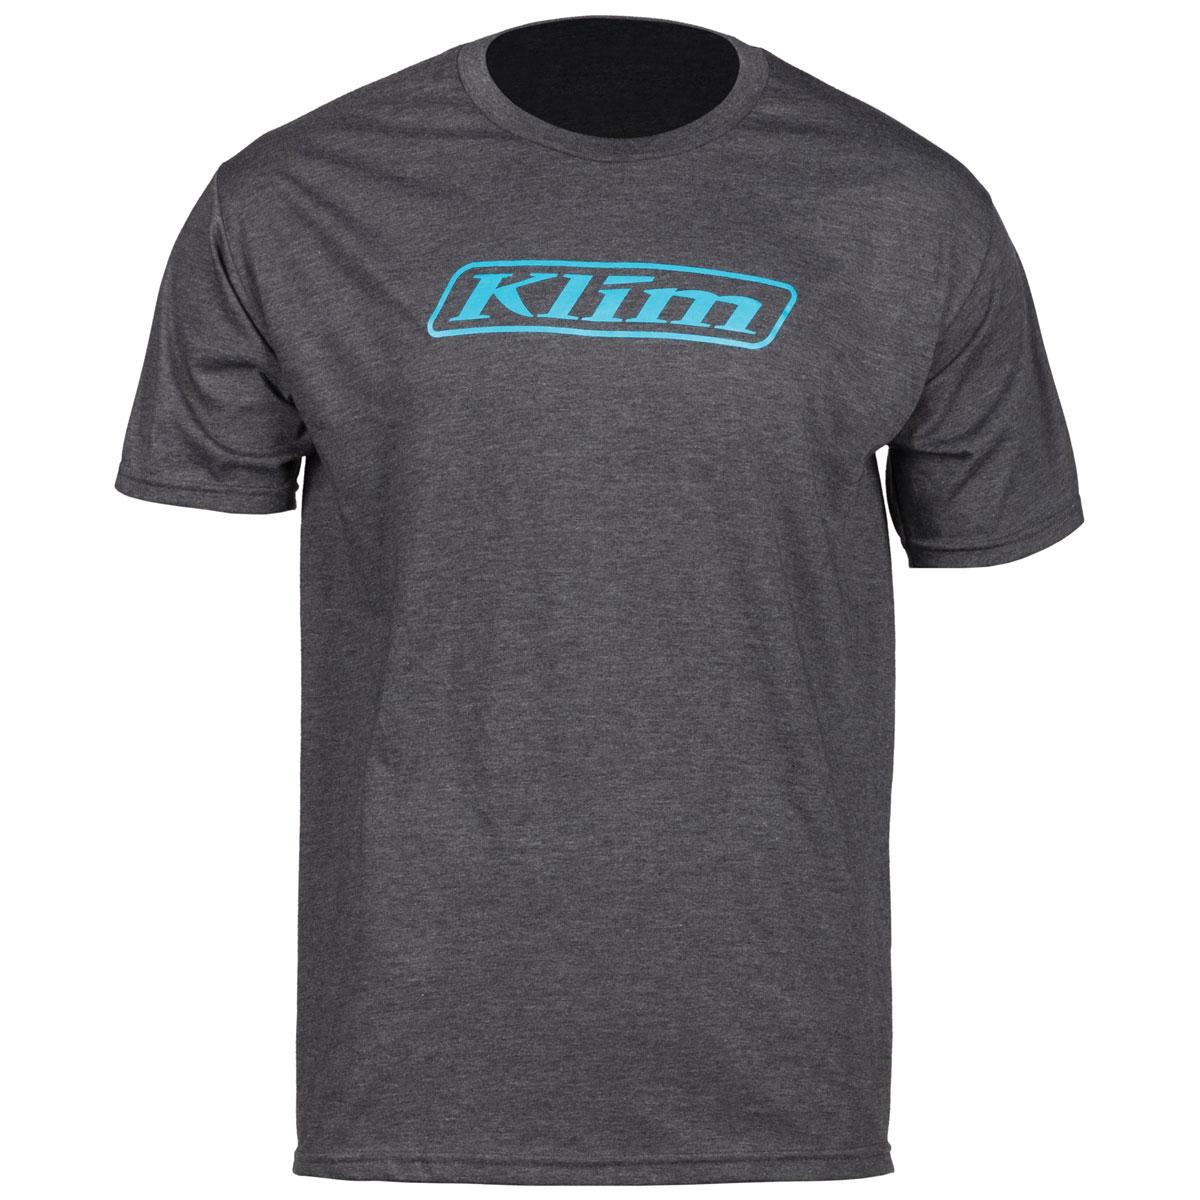 Klim Men's Word Charcoal Gray T-Shirt